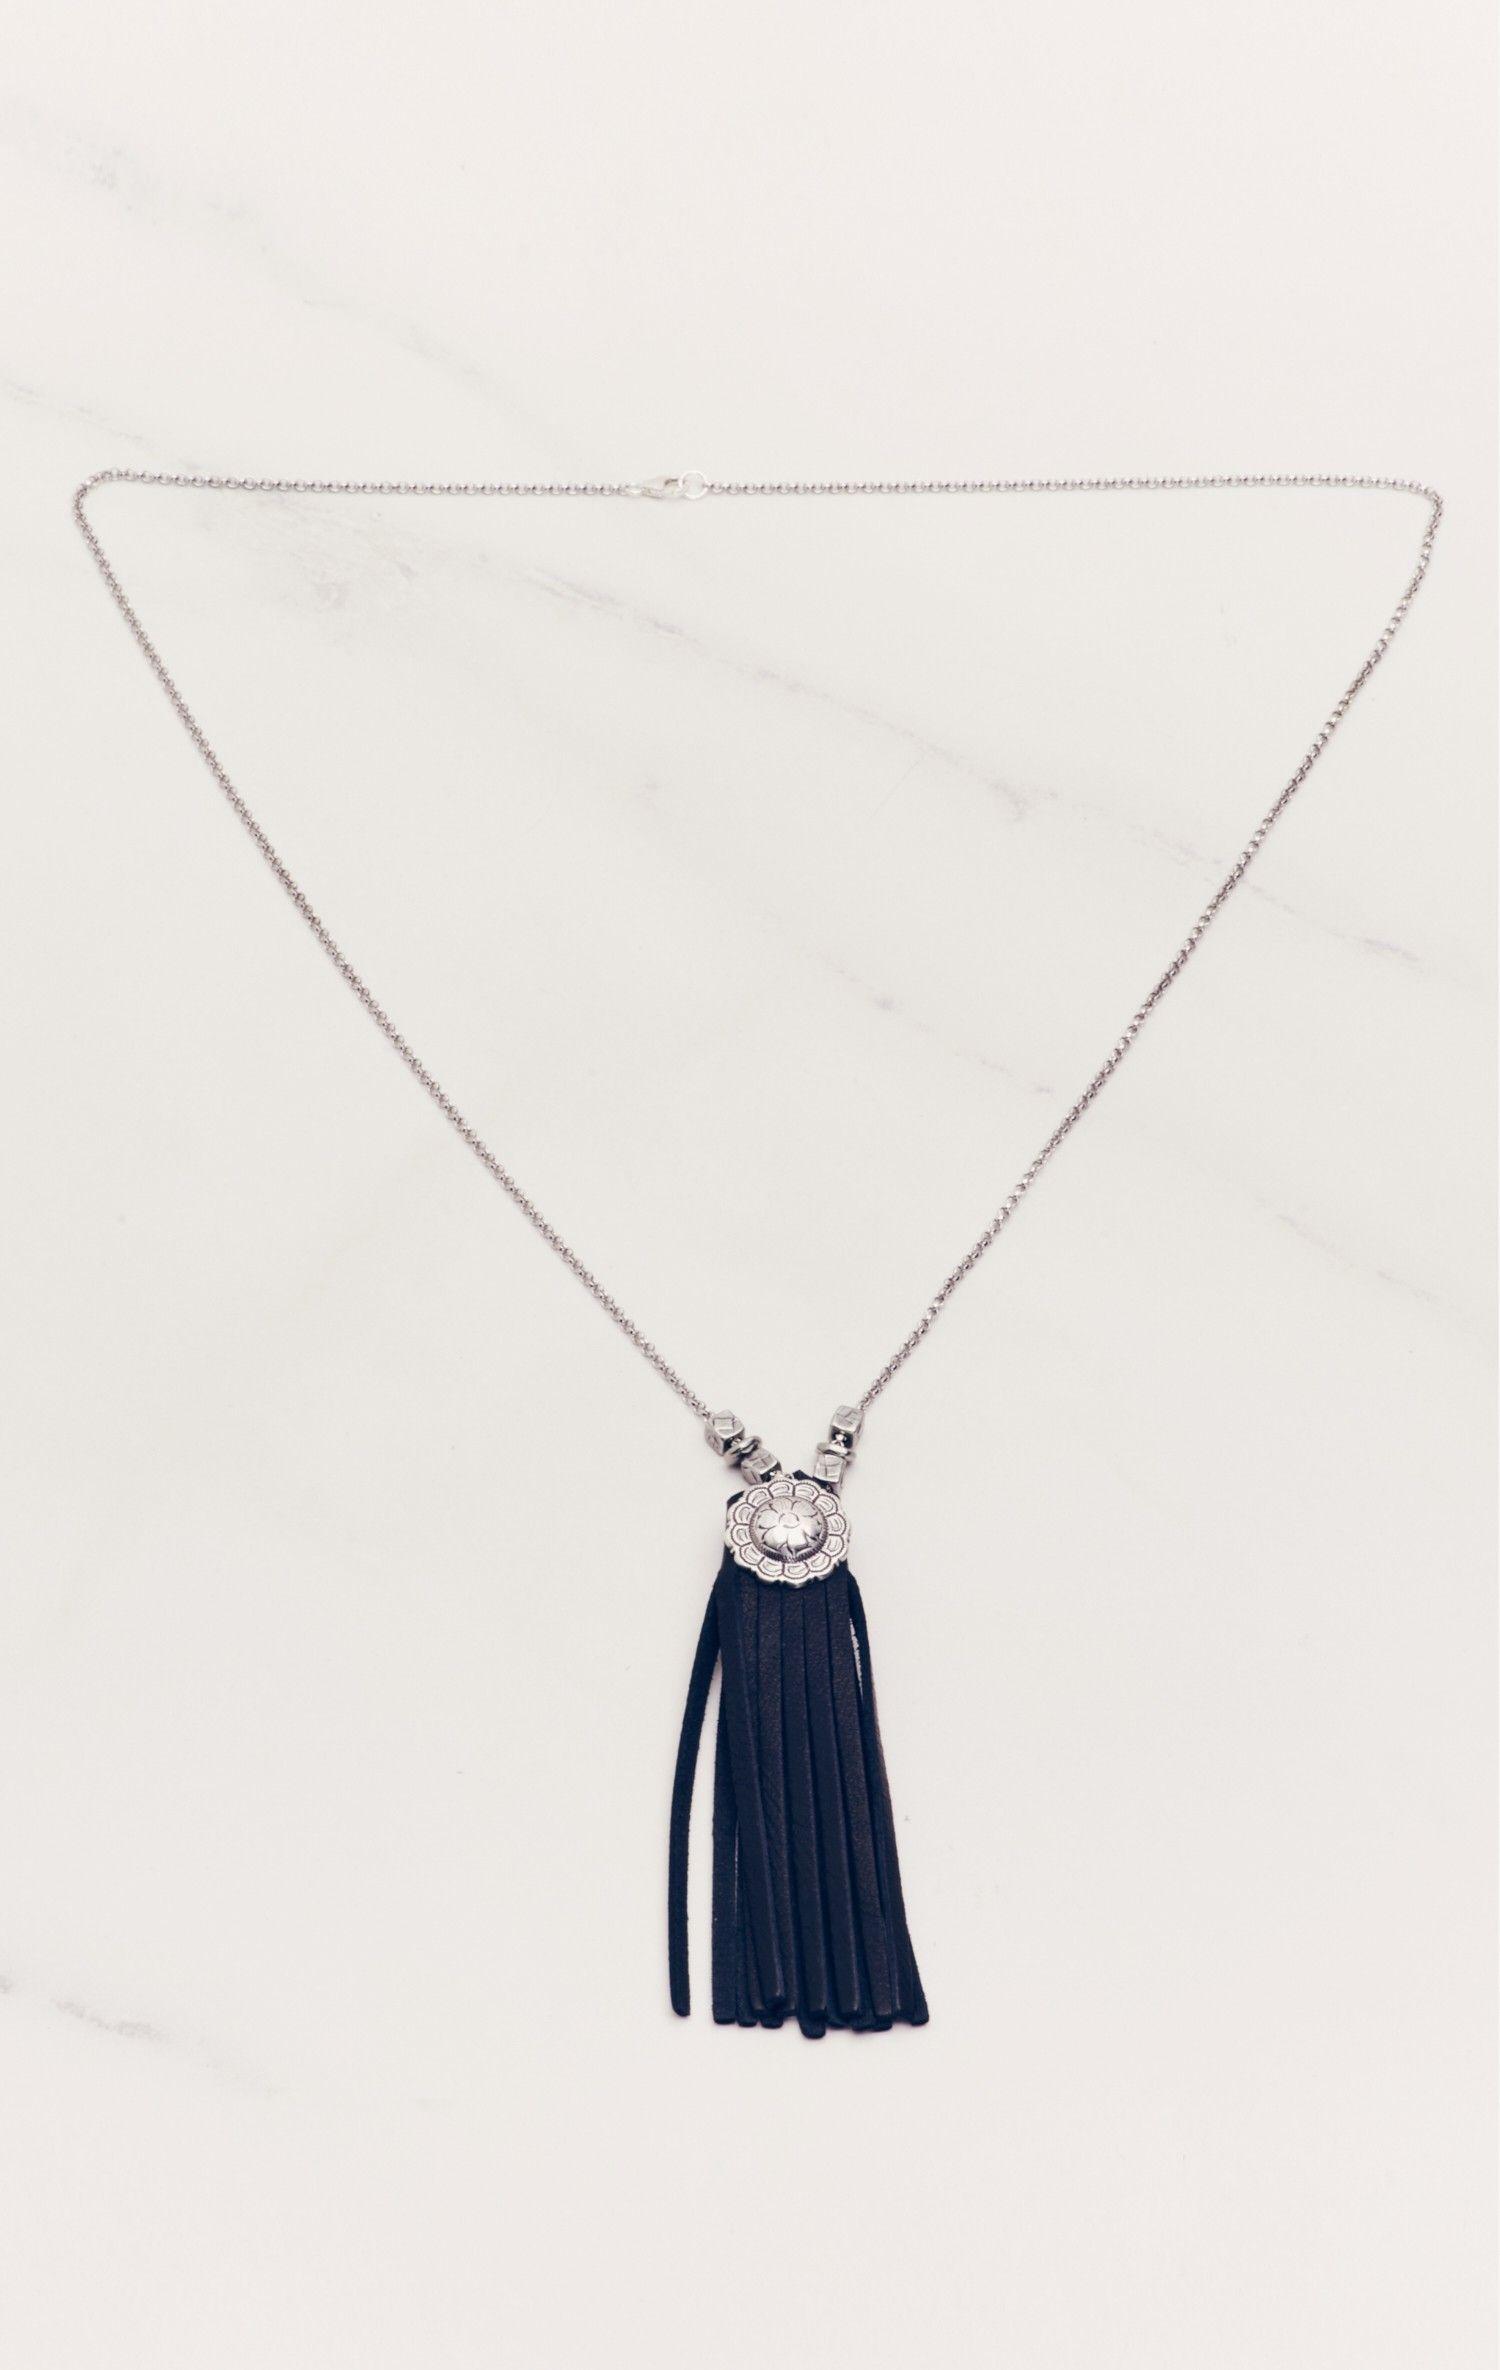 cea8db45d7 Saloon necklace